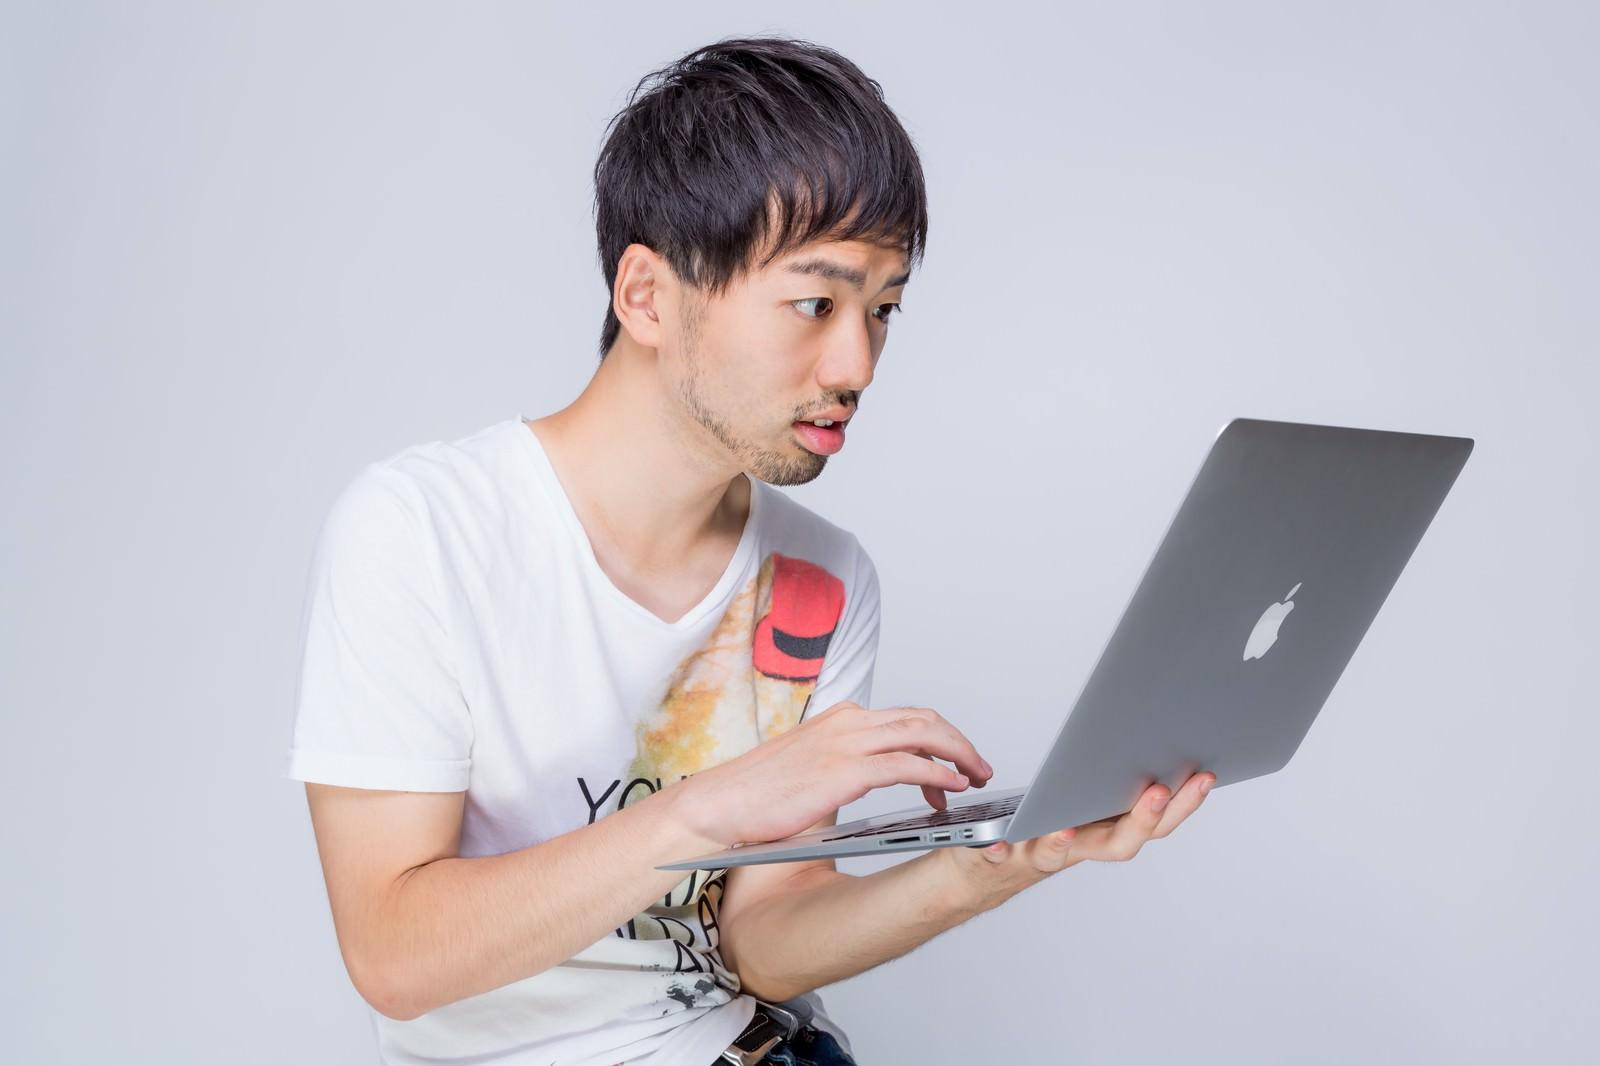 https://www.pakutaso.com/shared/img/thumb/LIG_hiroyukiMBA_TP_V.jpg